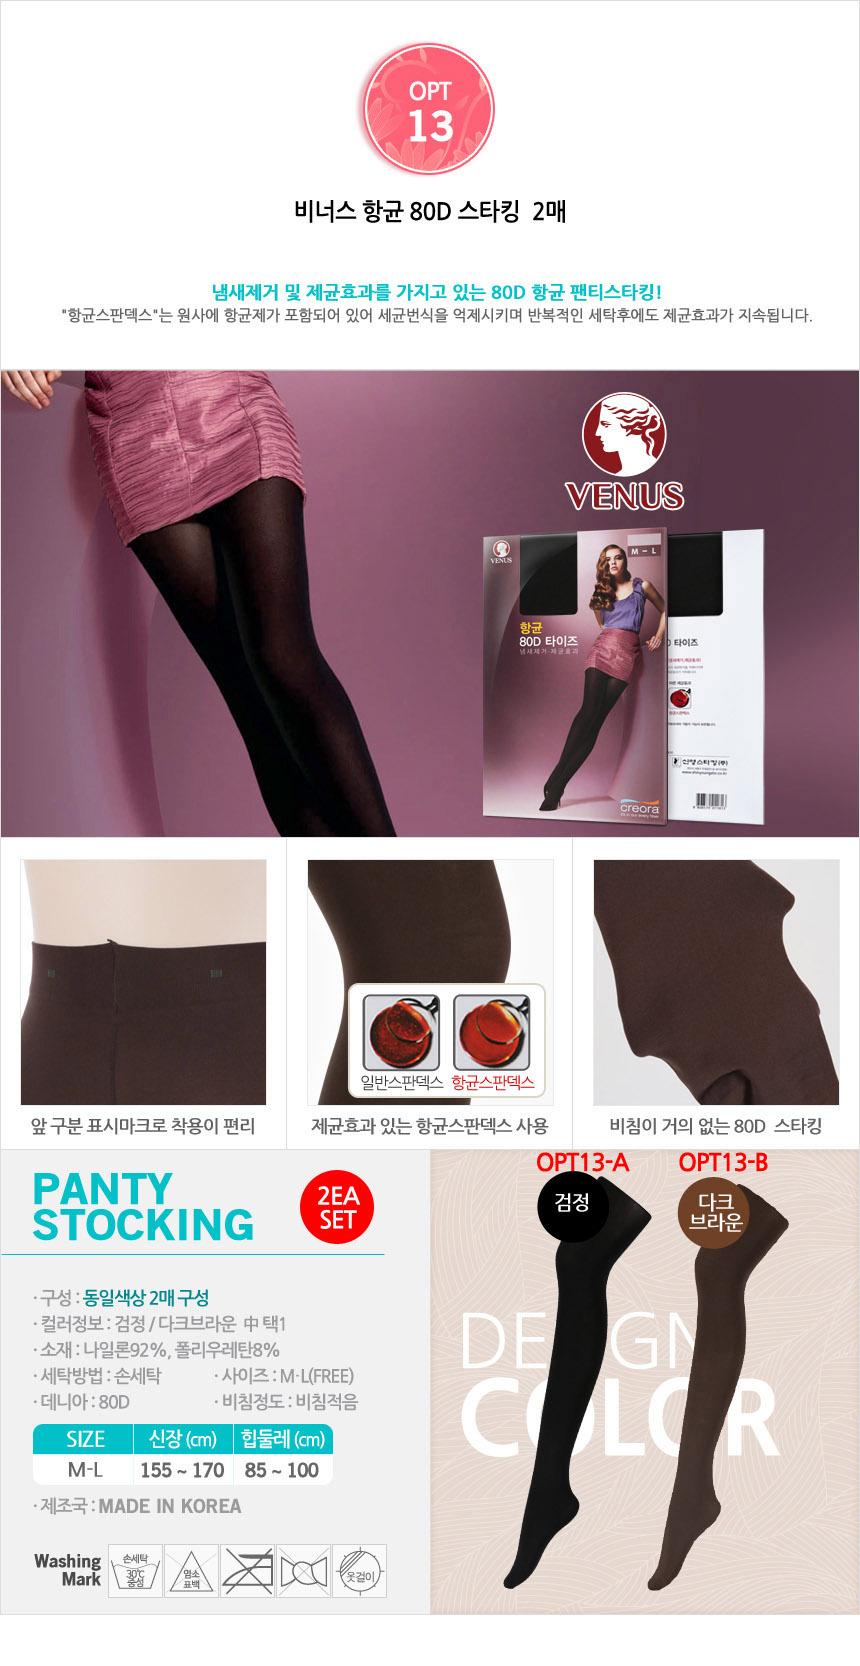 ebdb8b3b71f  12 set stocking free shipping Tights Venus vivien Pressure panty stocking hi-support elasticity  stocking hip up hip up stocking leggings  womens  ...